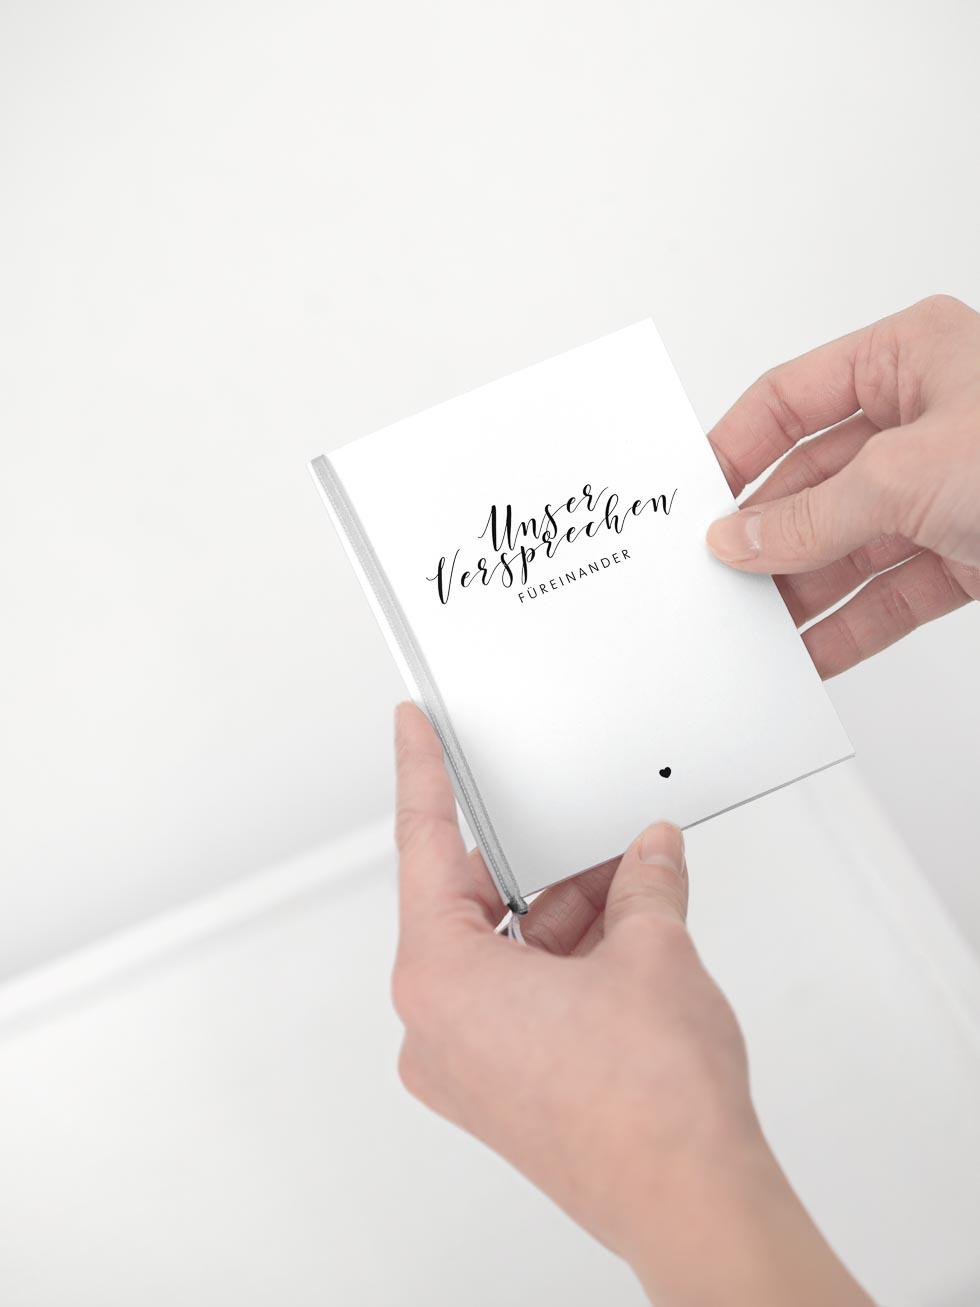 treueversprechen booklet - Ehegelobnis Beispiele